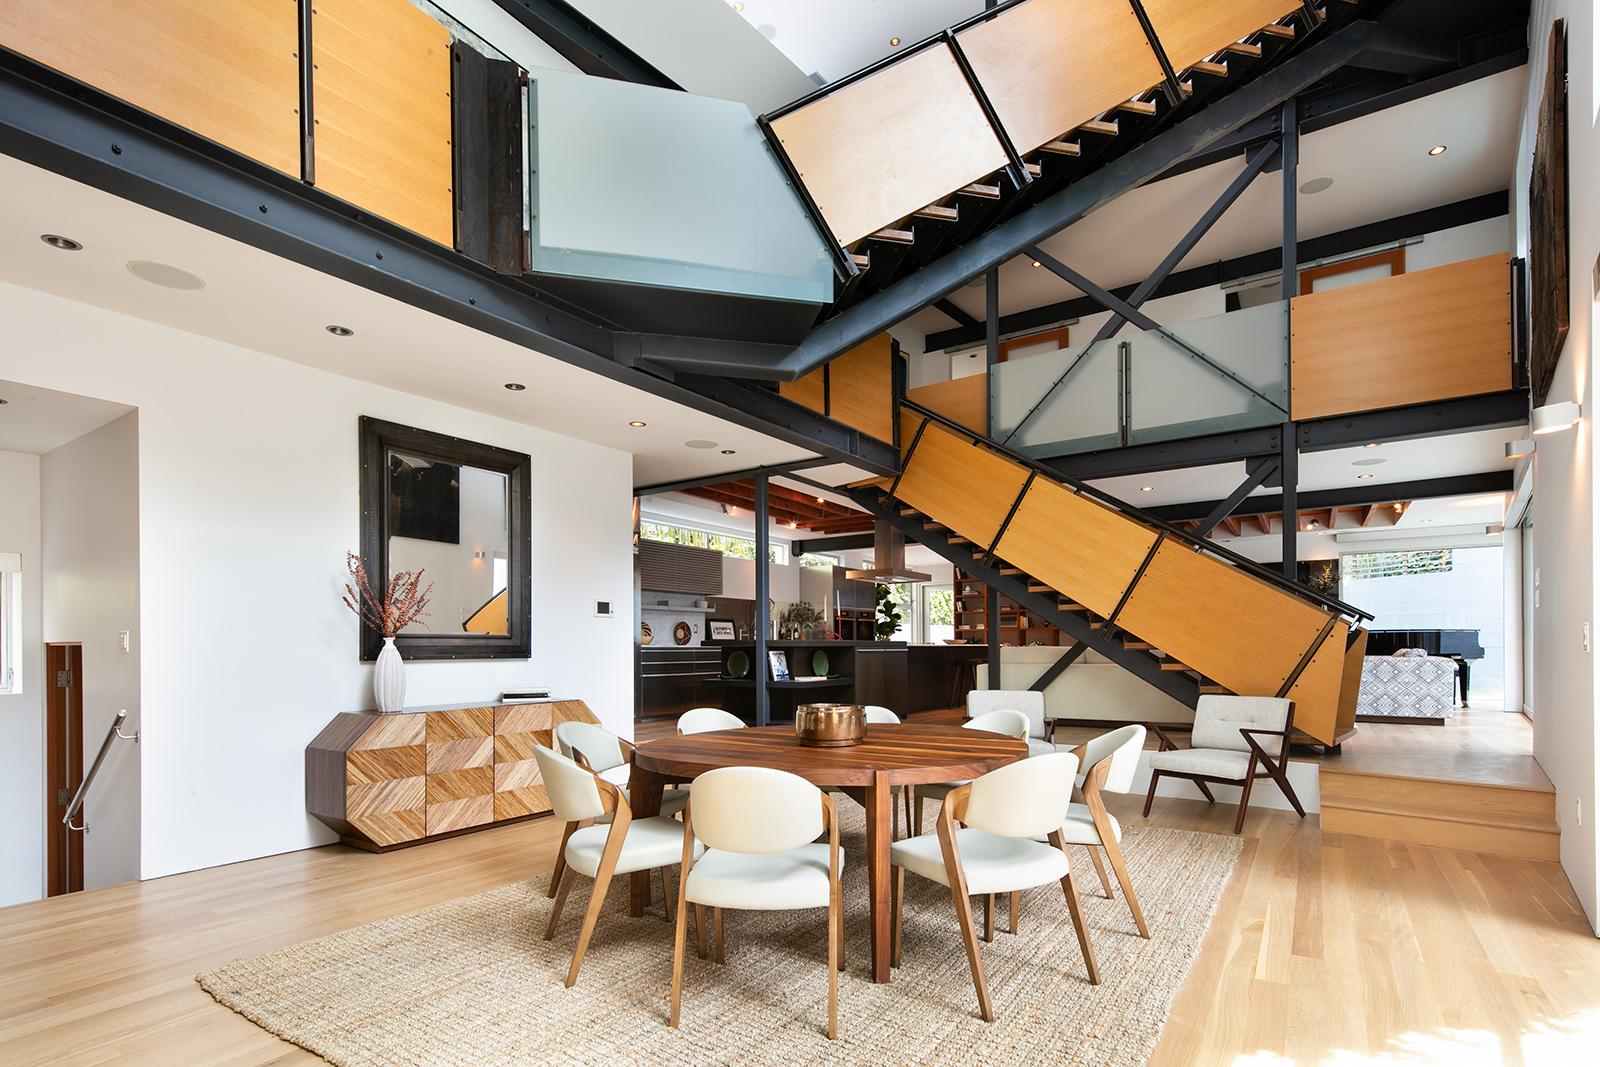 Free-flowing Santa Monica home unfurls around a zig-zag staircase